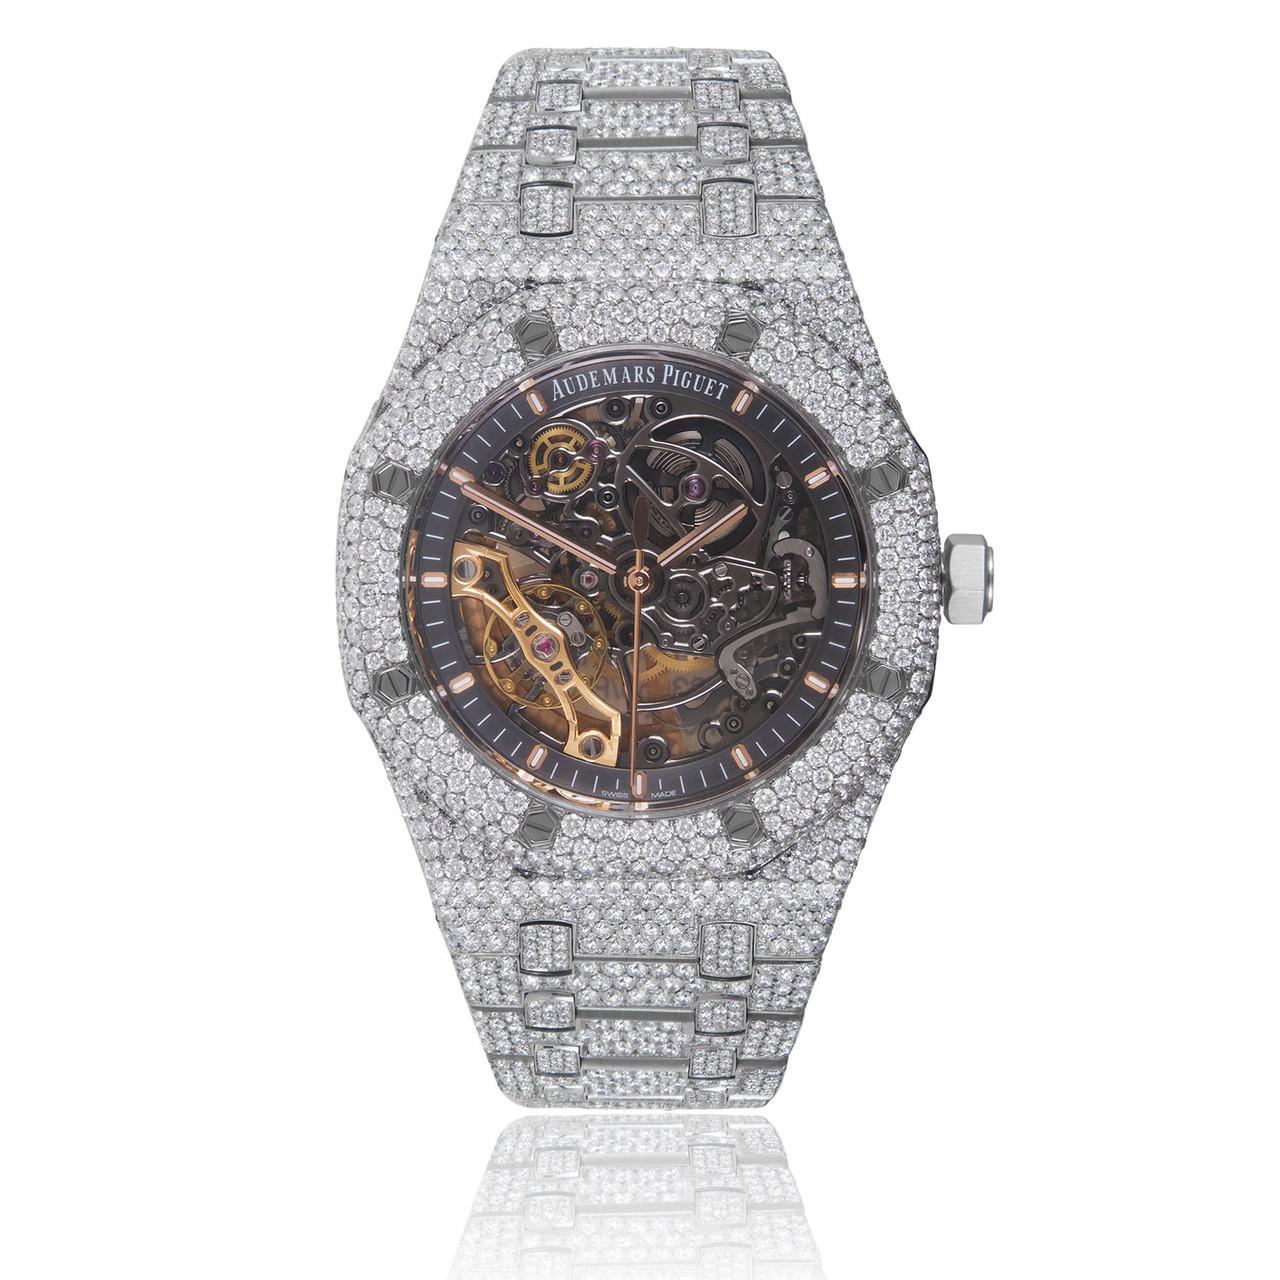 Audemars Piguet Skeleton Dial Royal Oak 28ct Diamond Watch - Shyne Jewelers 9771fd8bf